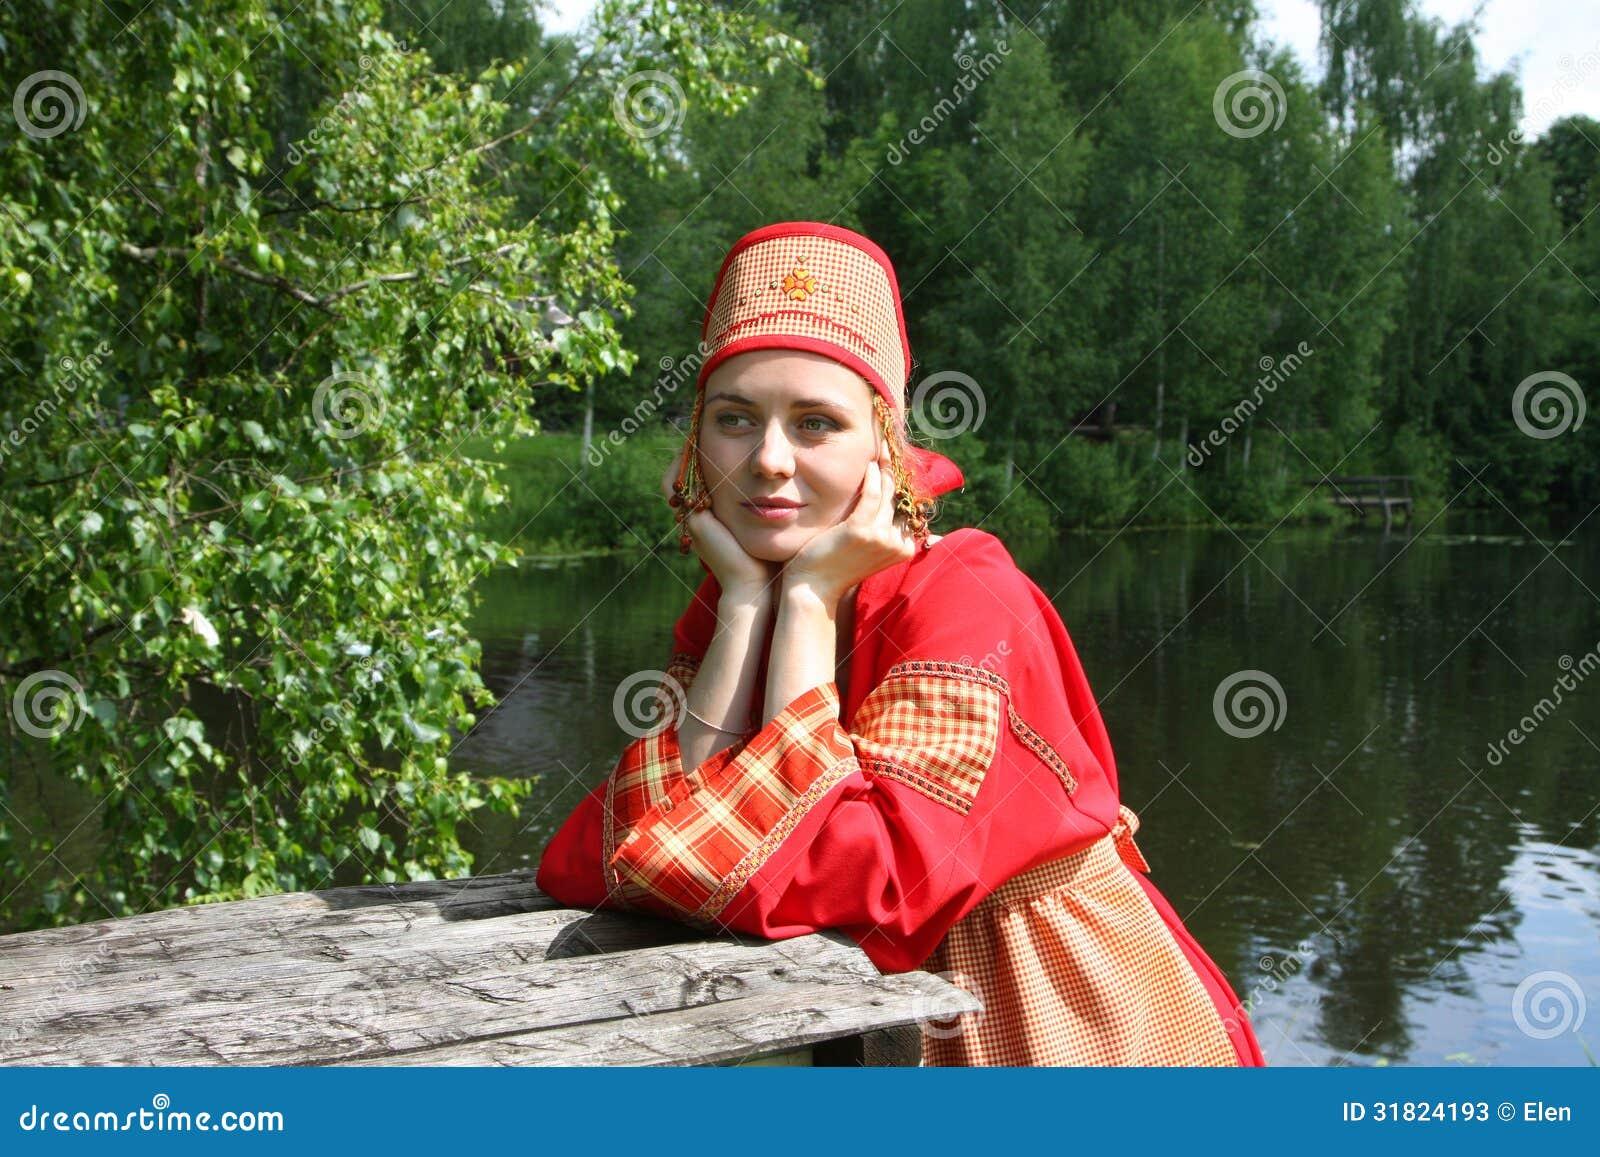 Анна седокова xxx21